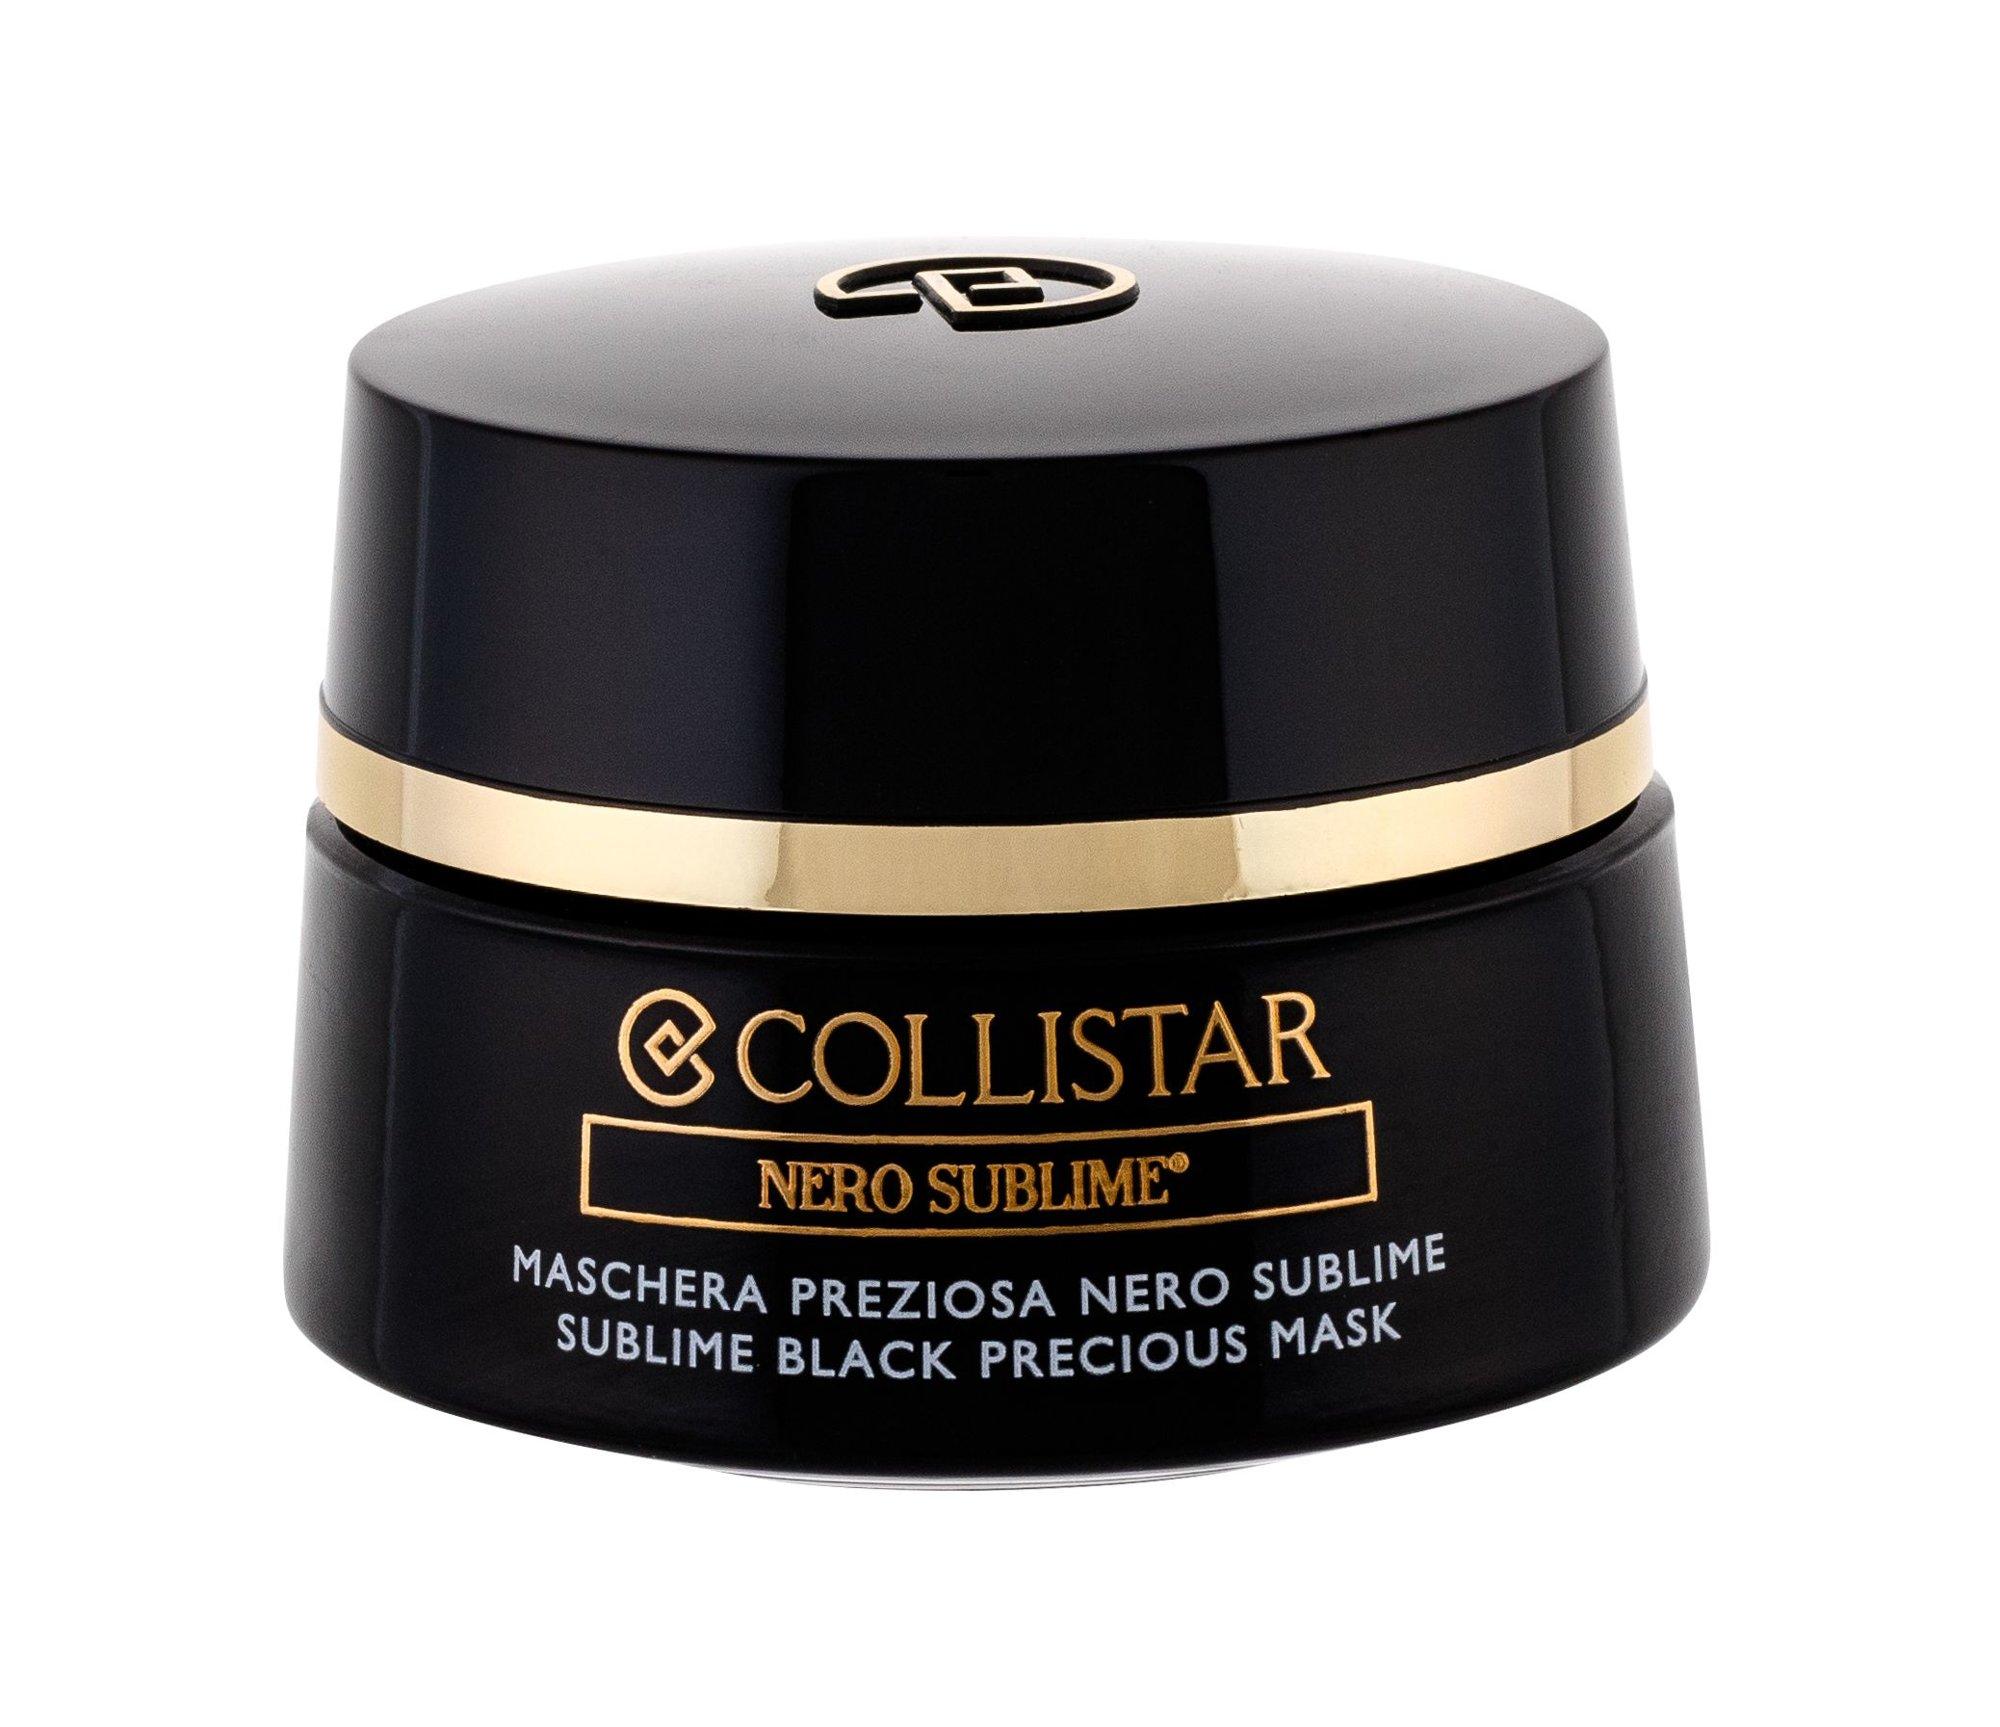 Collistar Nero Sublime Face Mask 50ml